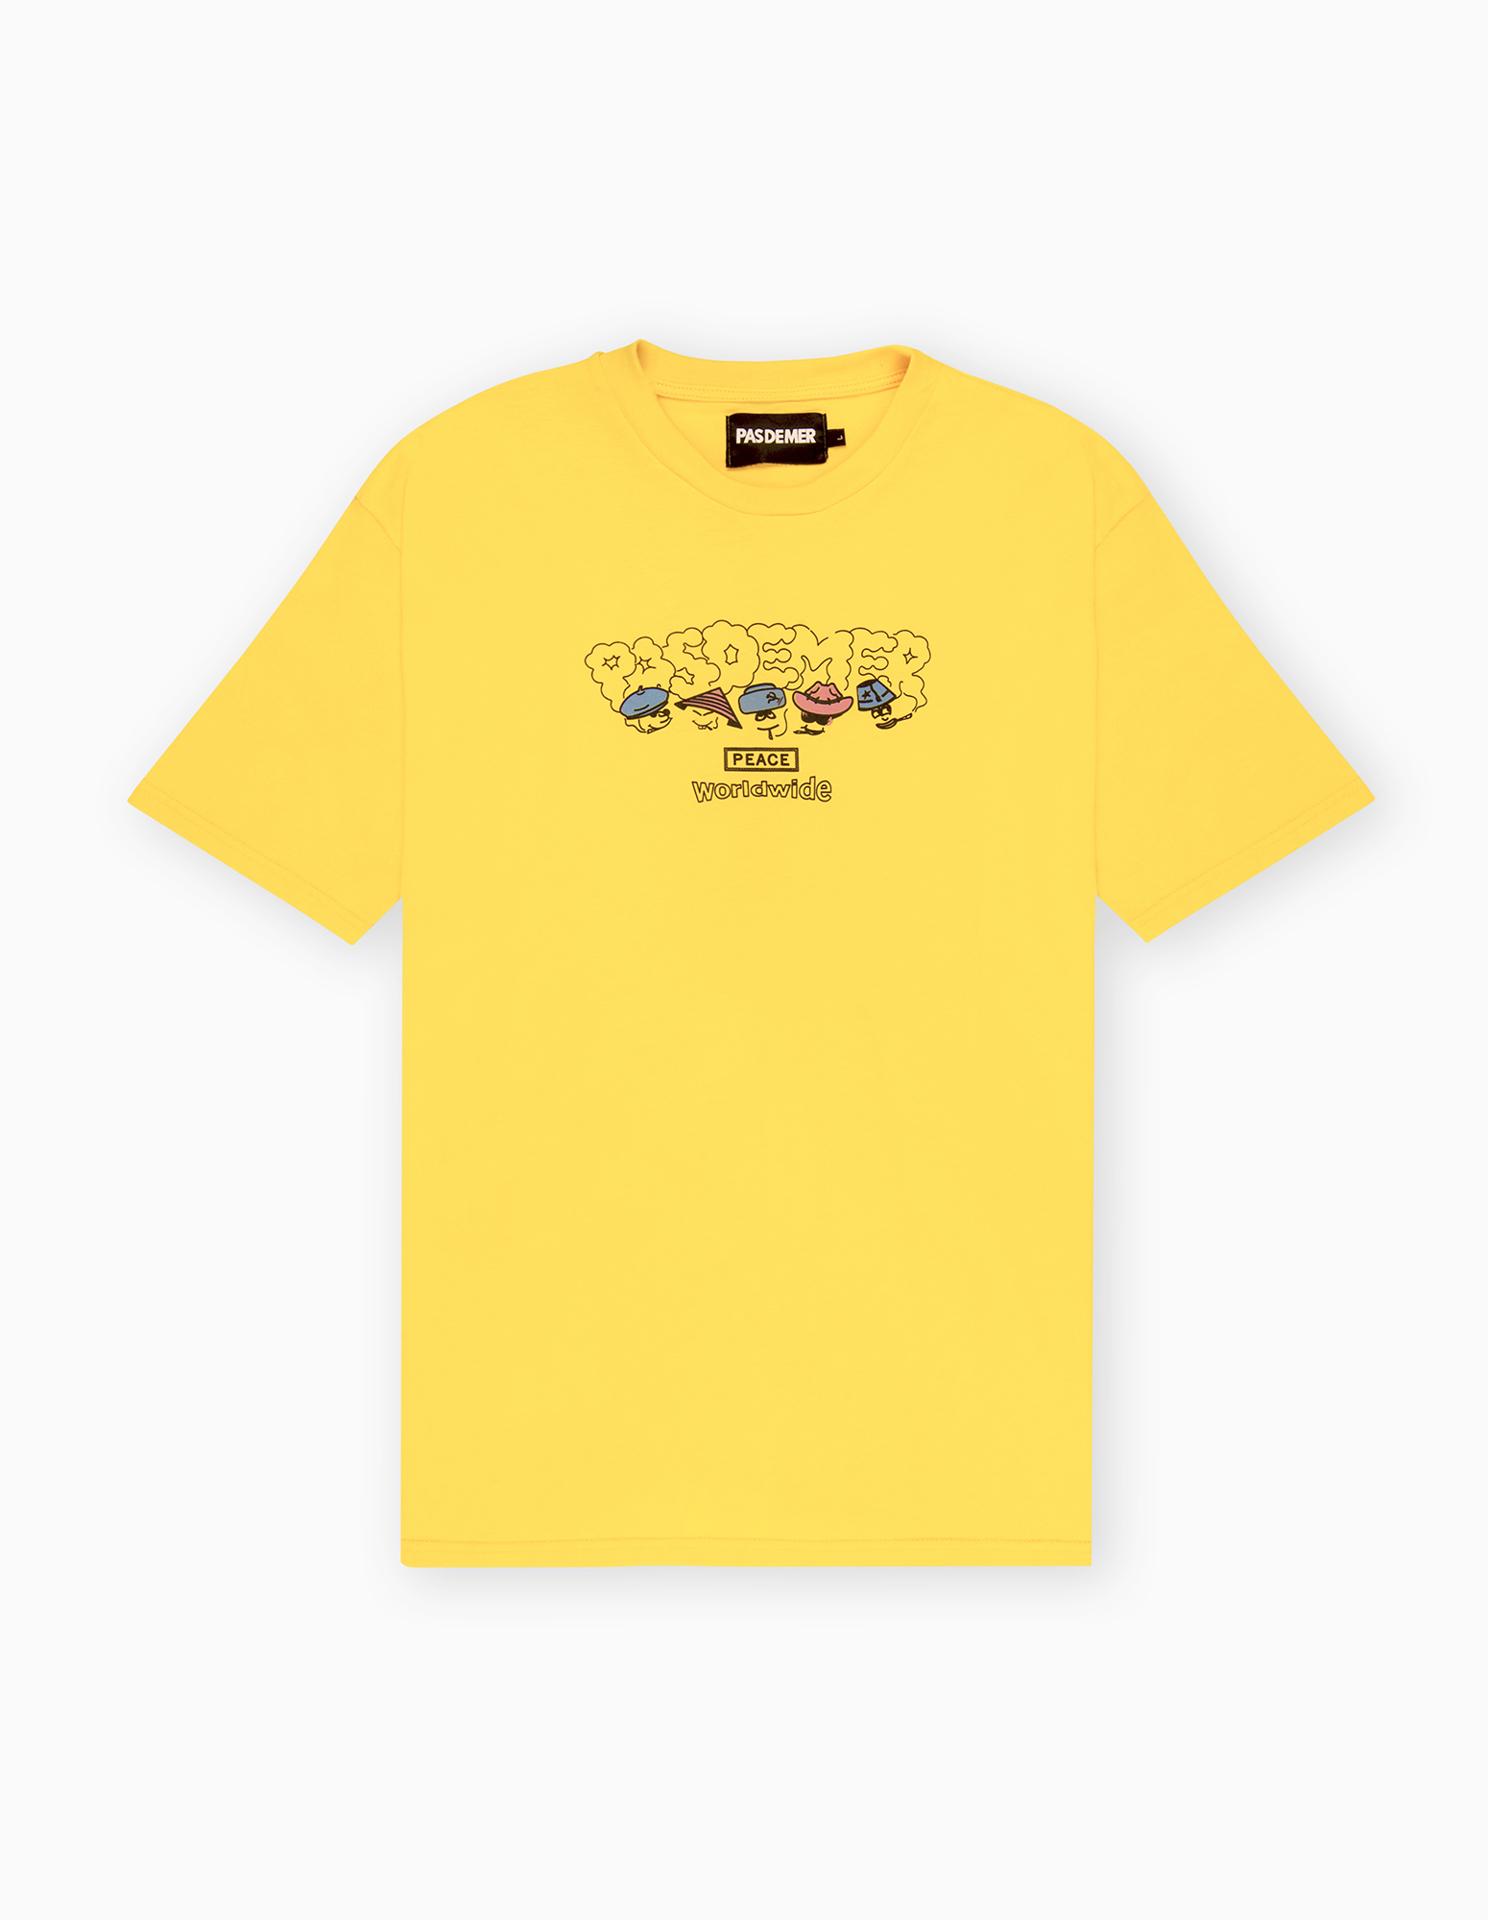 【PAS DE MER/パドゥメ】PEACE T-SHIRT Tシャツ / YELLOW